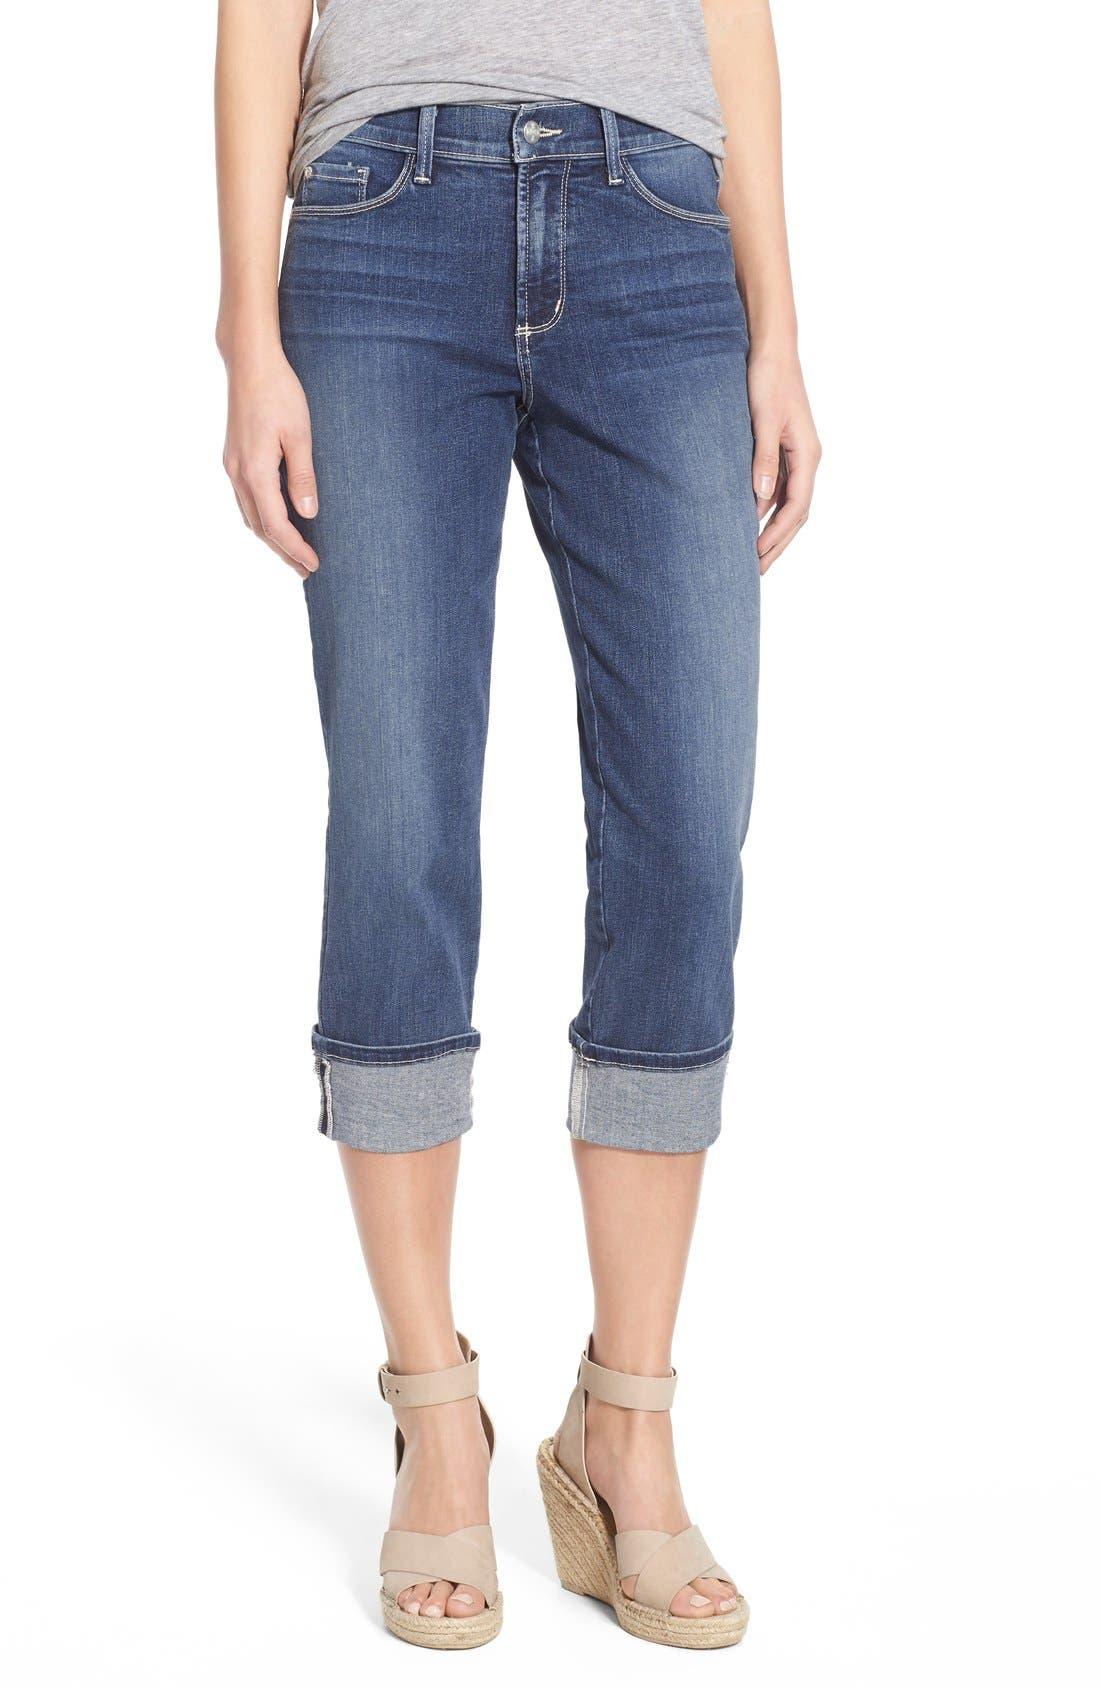 'Dayla' Colored Wide Cuff Capri Jeans,                             Main thumbnail 8, color,